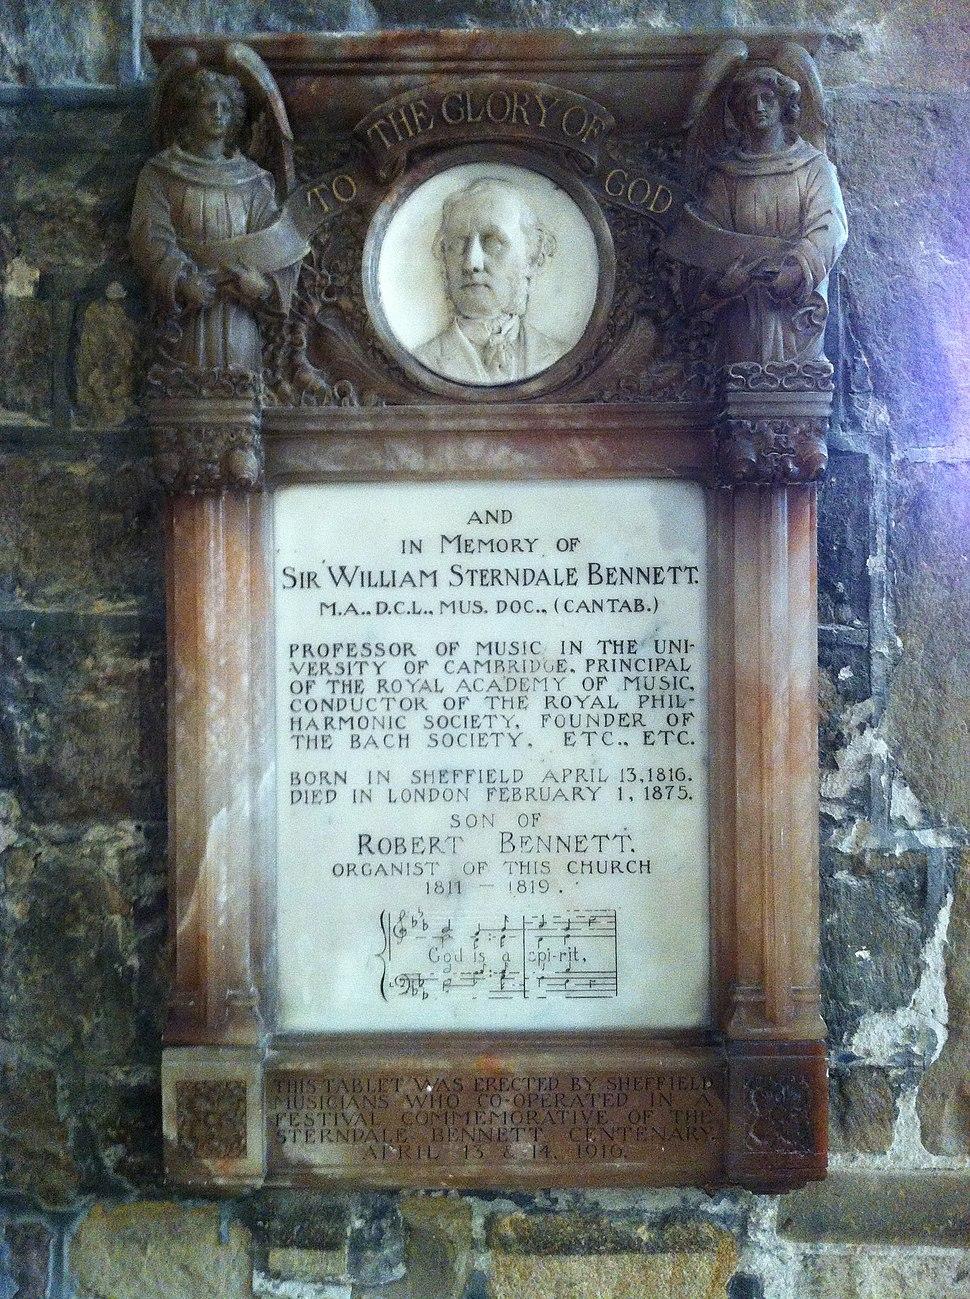 Memorial to Sir William Sterndale Bennett